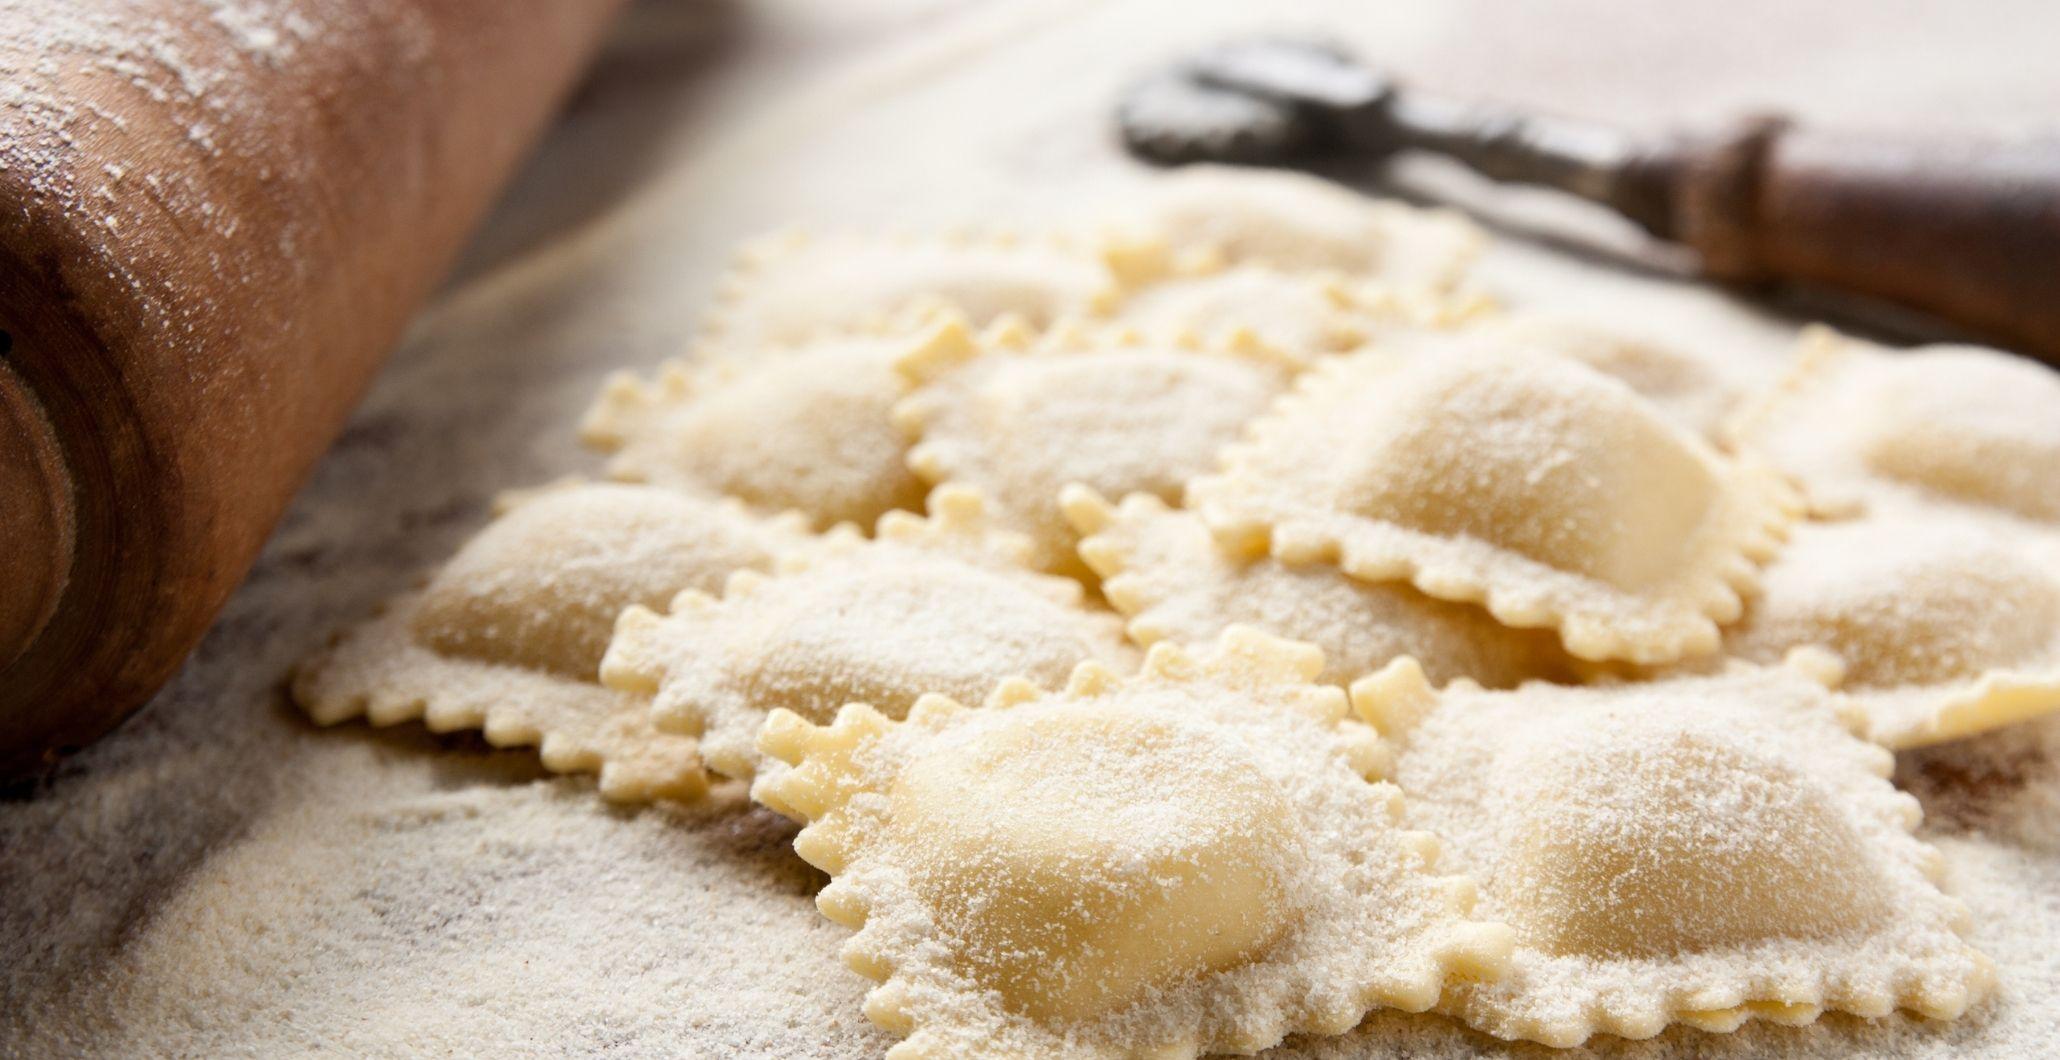 Learn to Make Homemade Ravioli